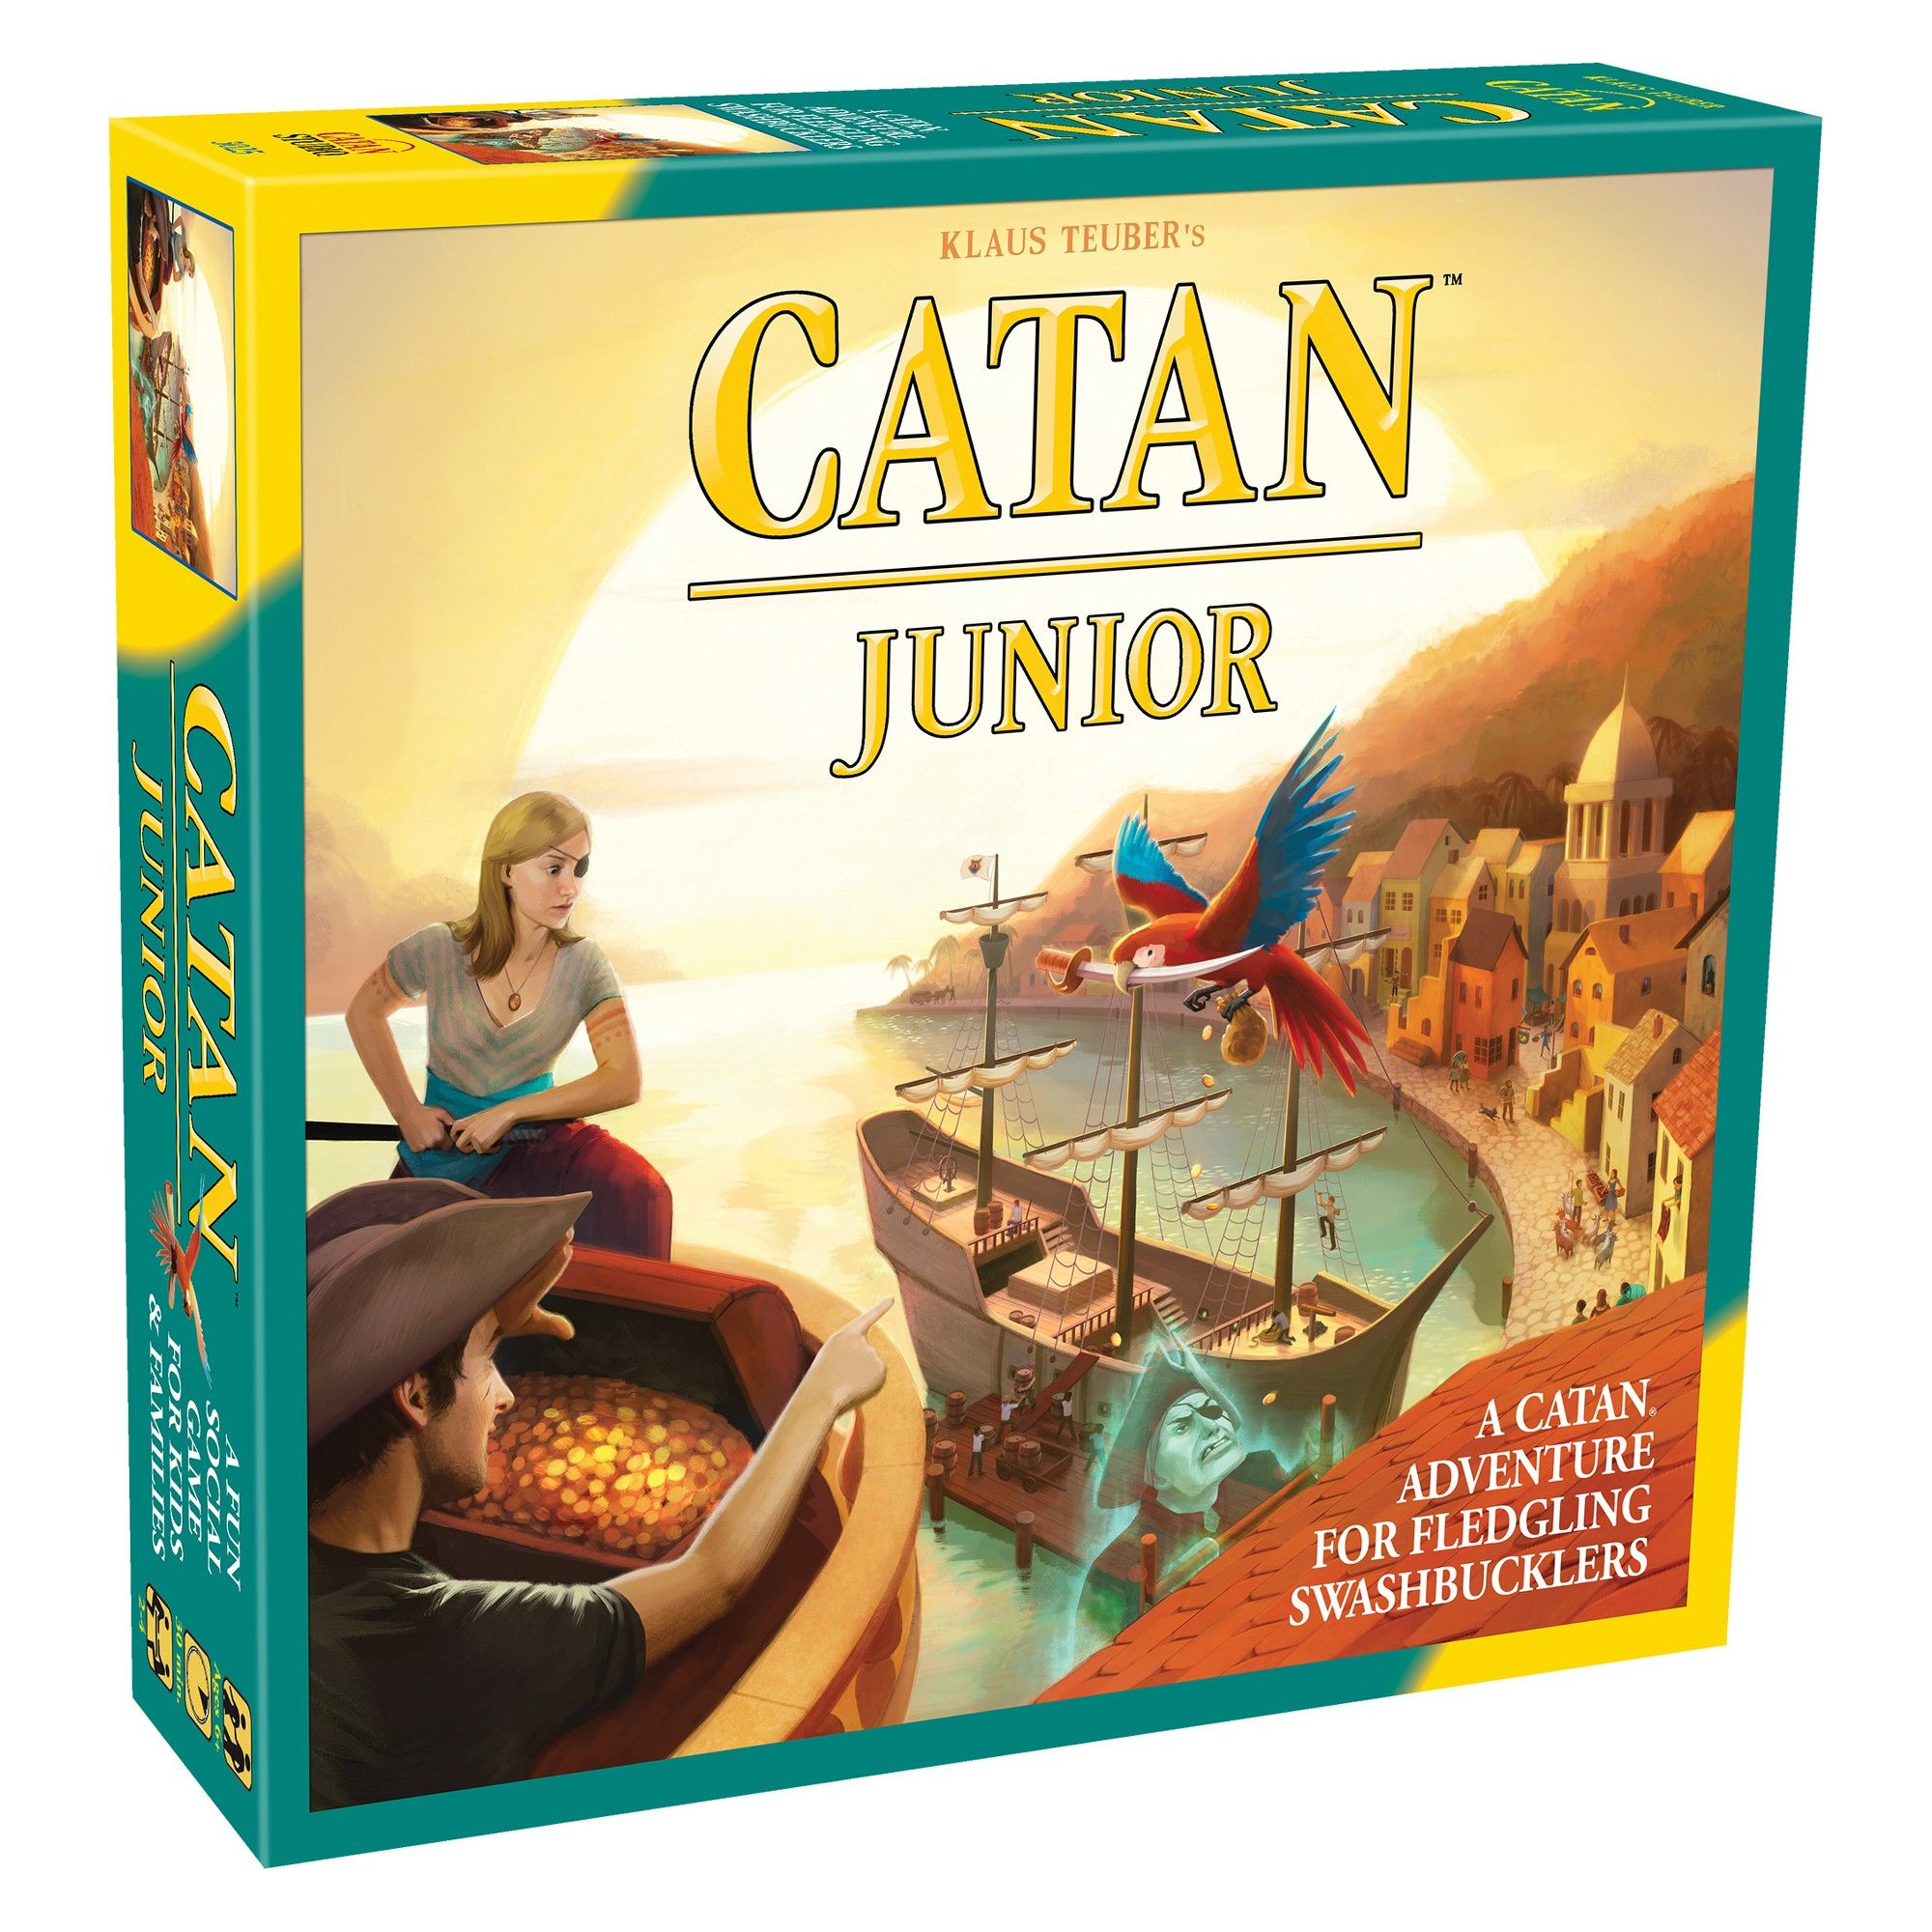 Catan Junior Game Catan junior, Sports games for kids